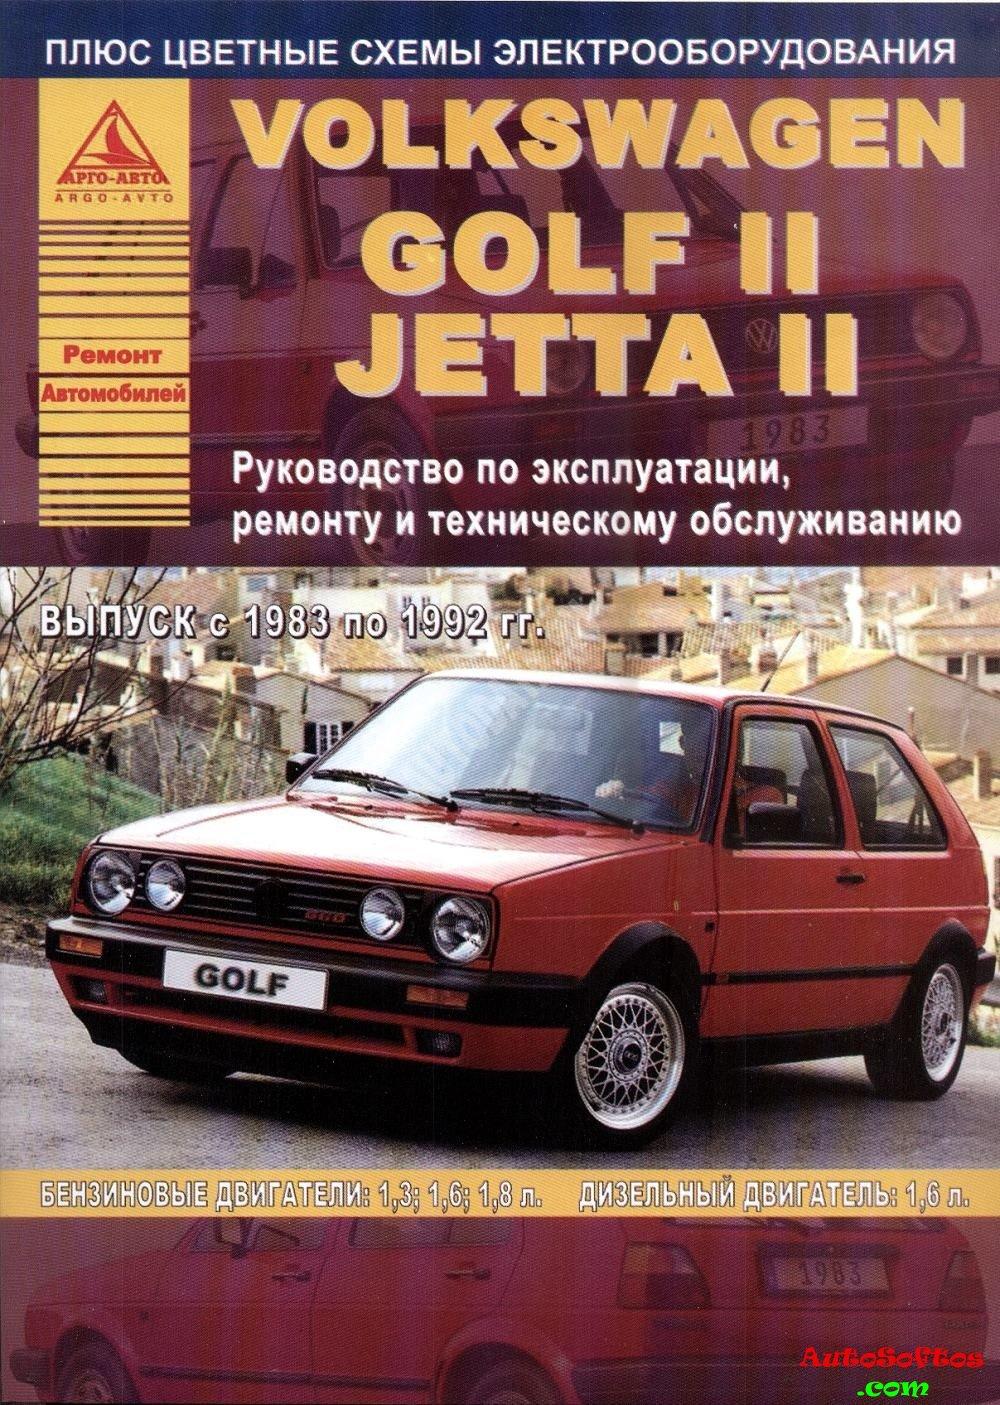 Volkswagen golf 4 программа для диагностики